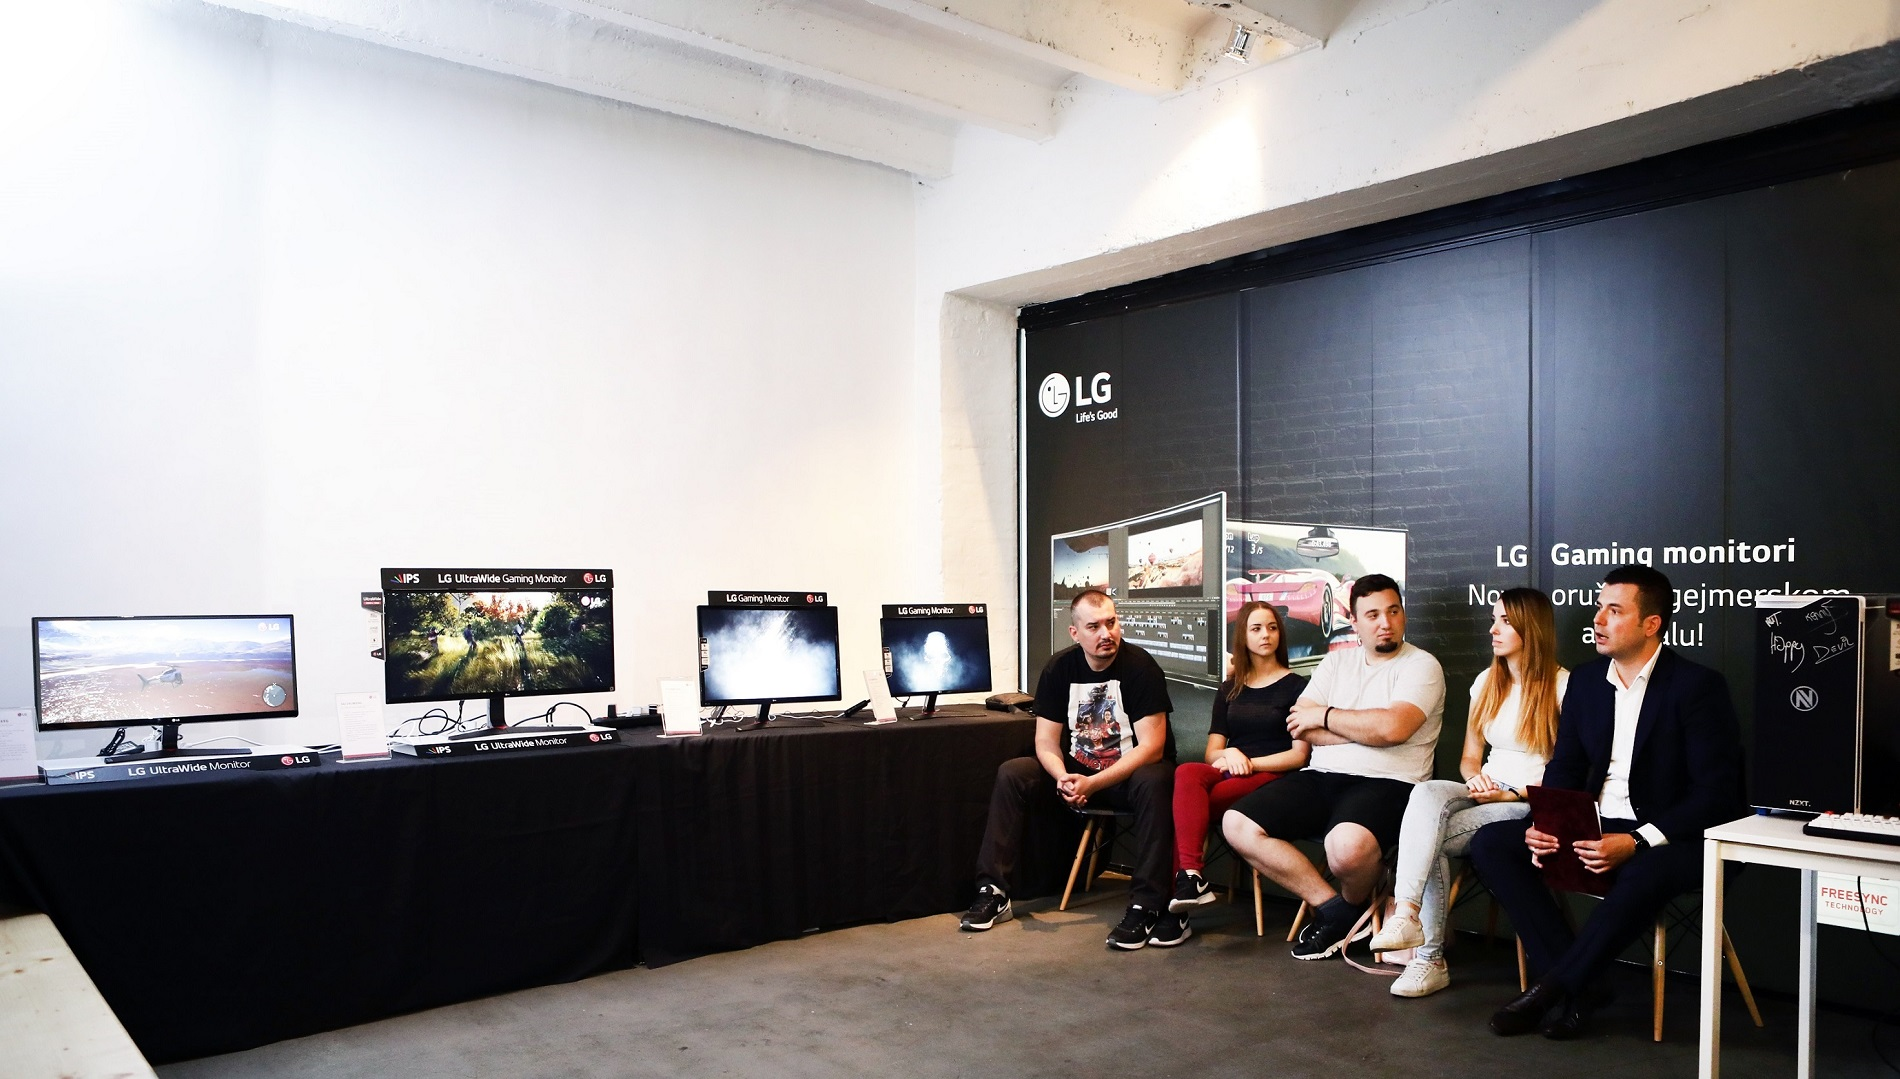 Predstavljanje novih LG gejming monitora_Konferencija